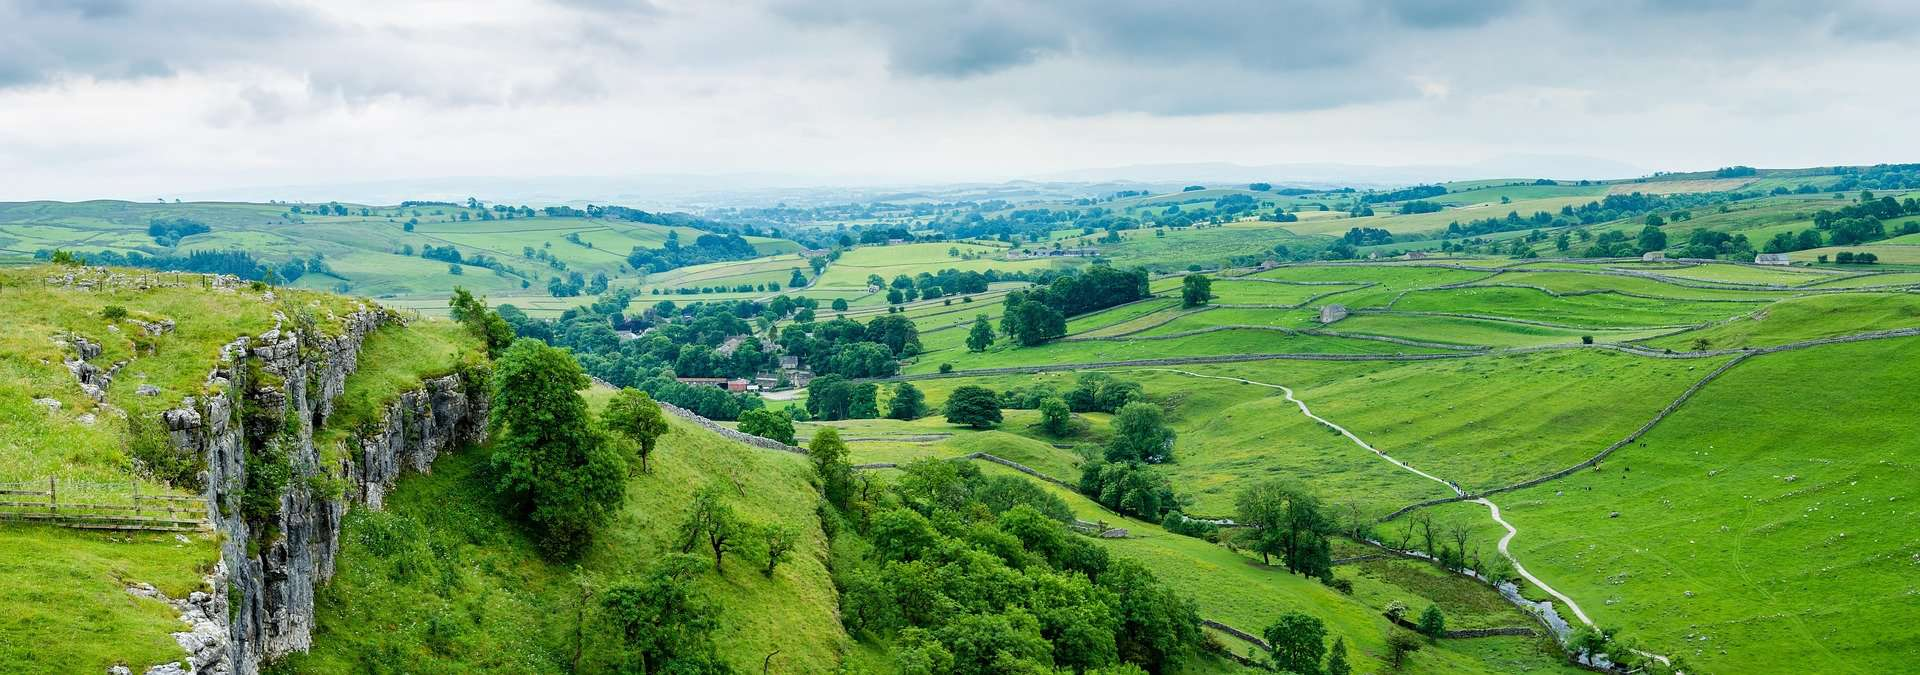 Rural Broadband in the UK